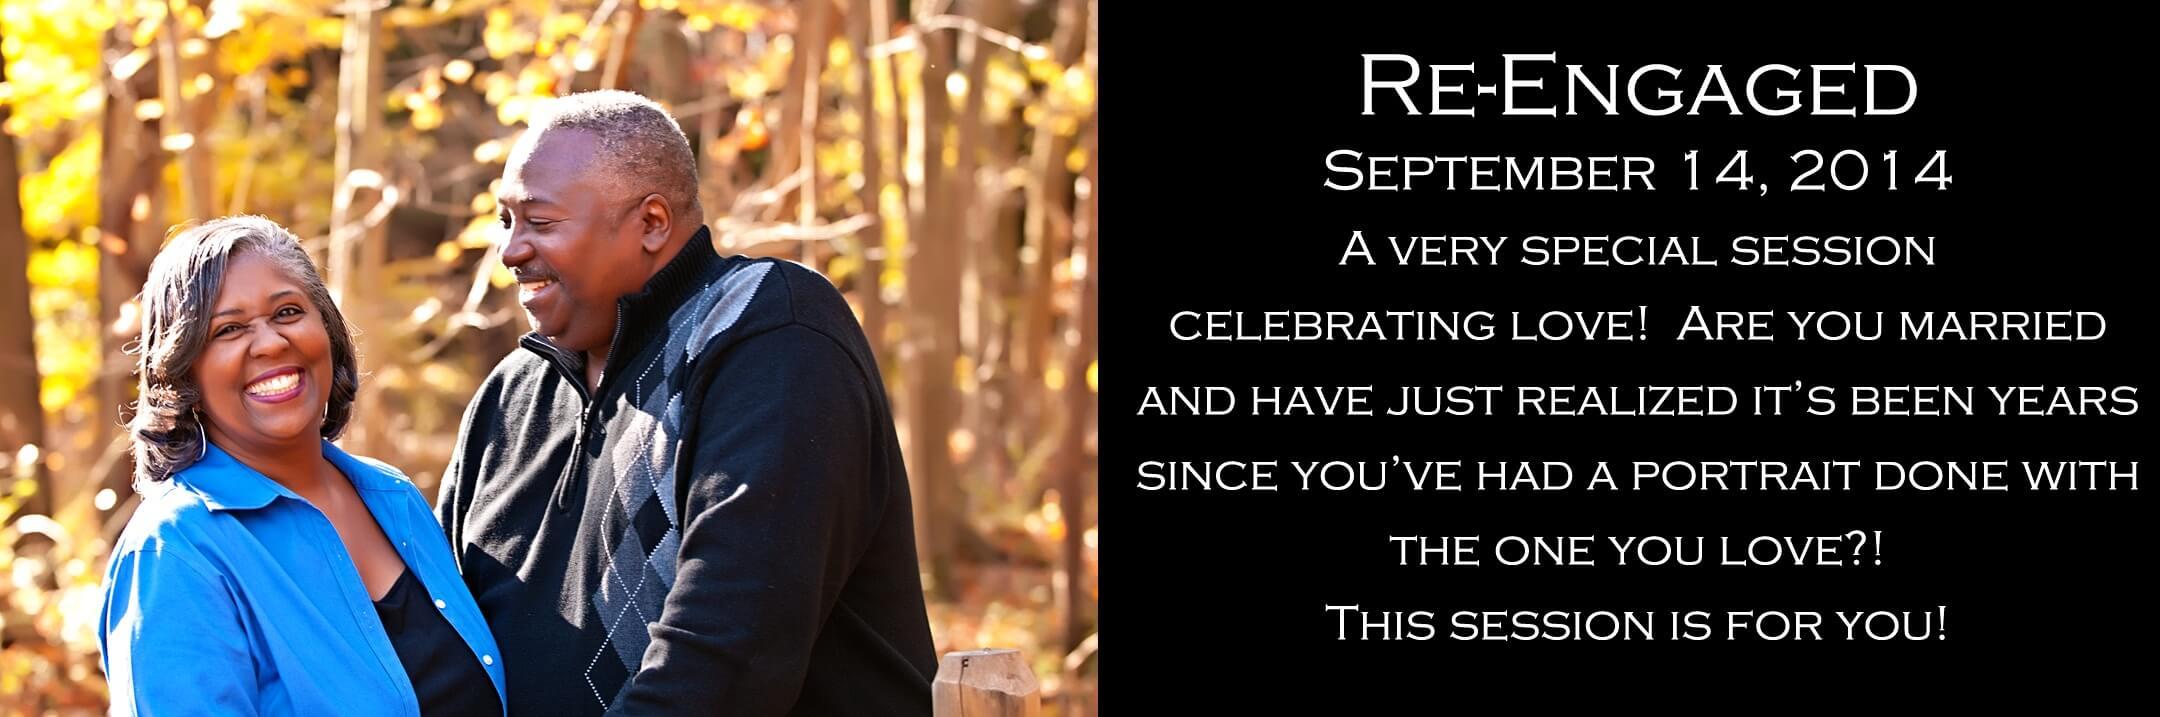 Re-Engaged Portrait Photography Studio Leesburg VA